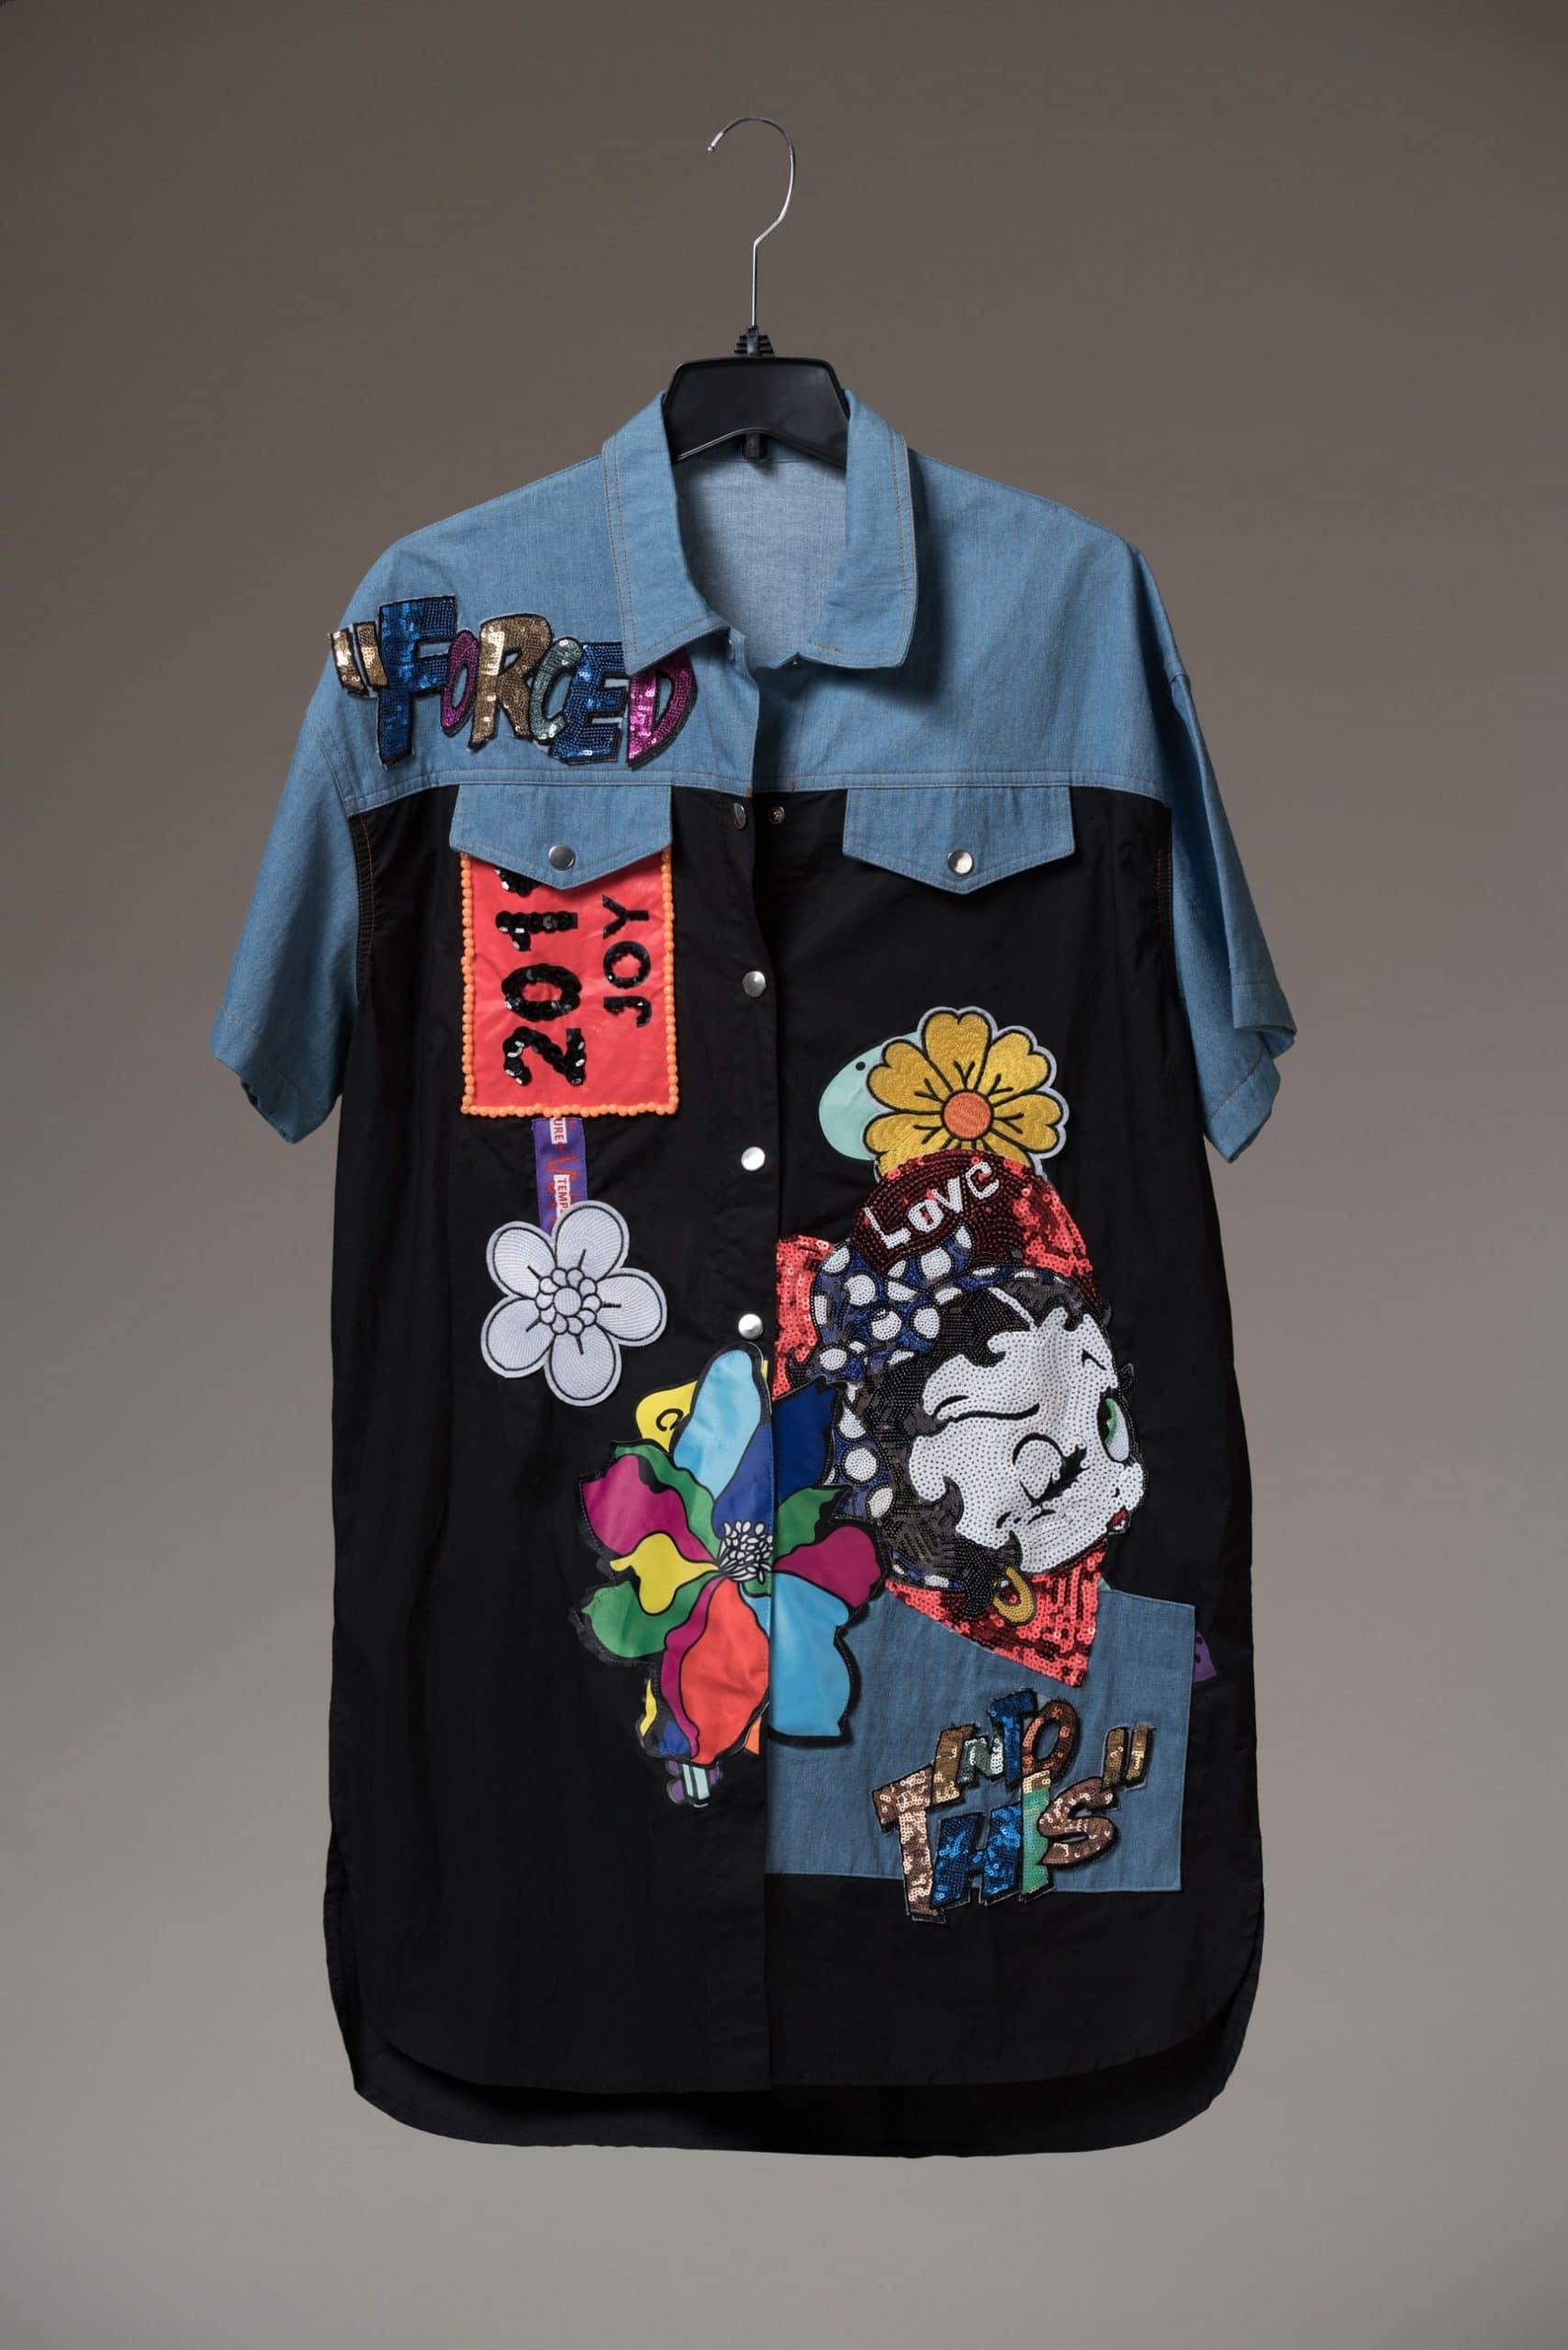 Farewell 2019 Embellished Denim and Black Shirt Dress For Fall Winter Spring Summer